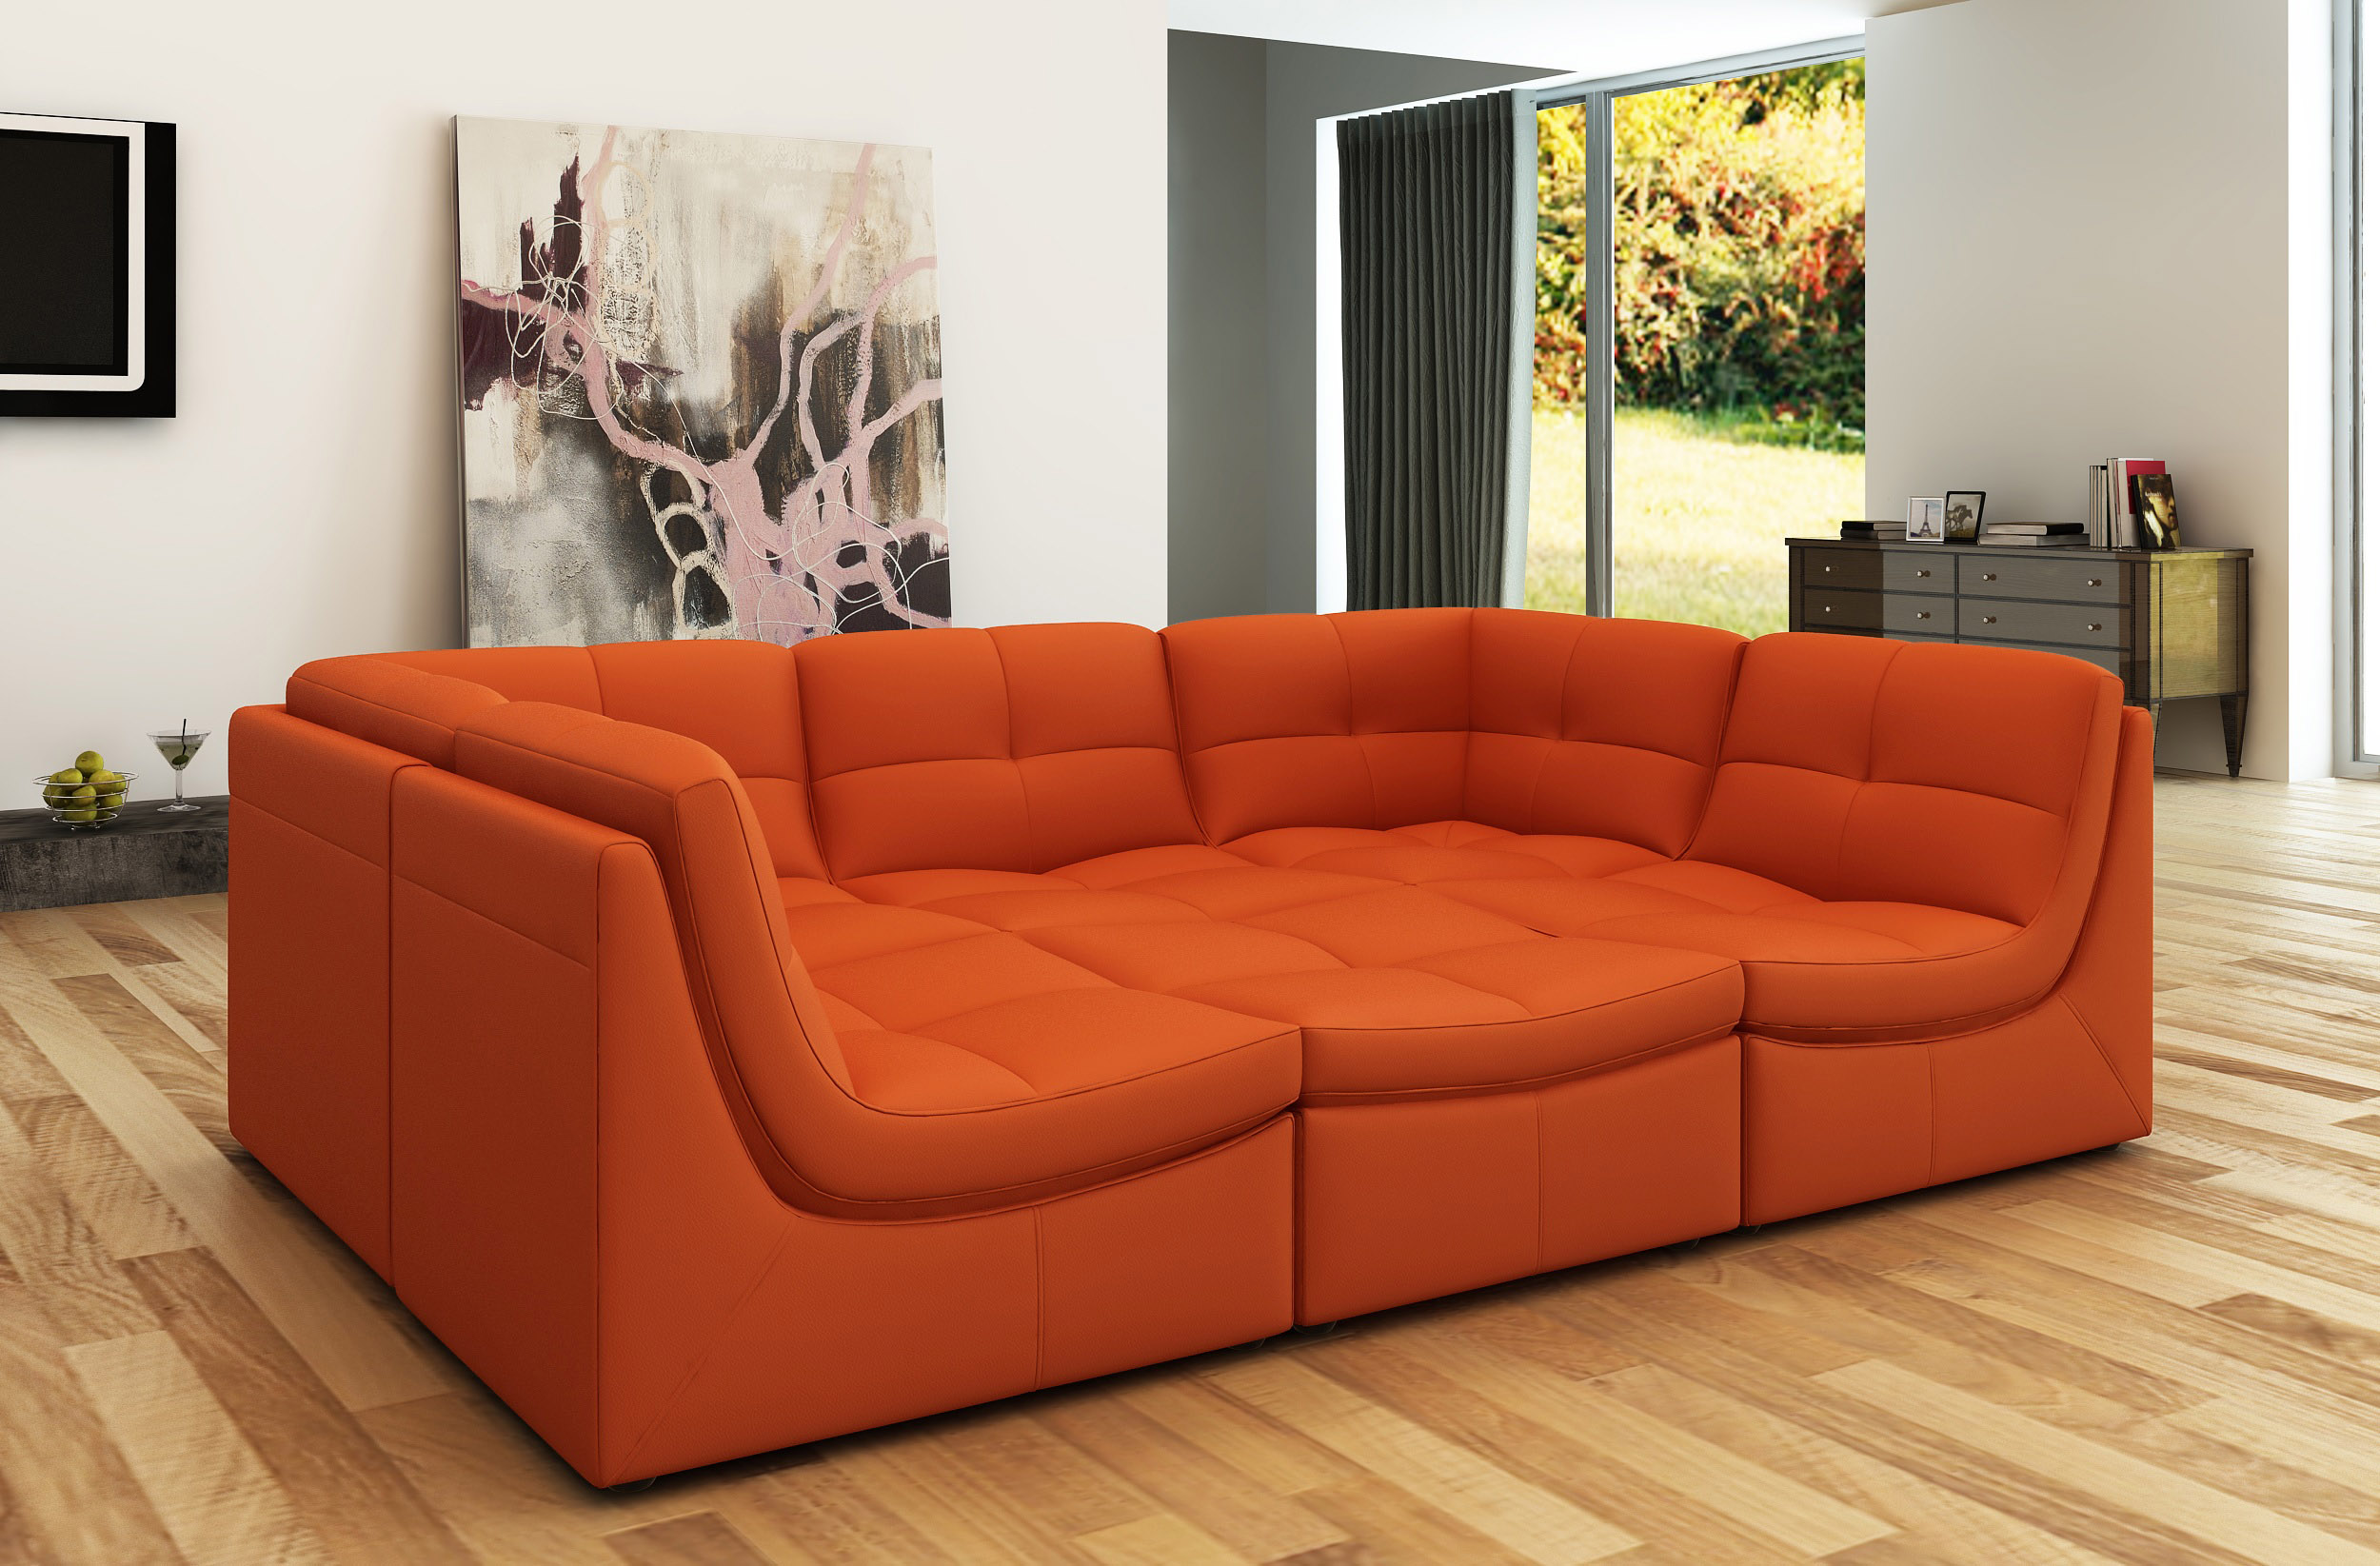 Elegant Tufted Leather Curved Corner Sofa